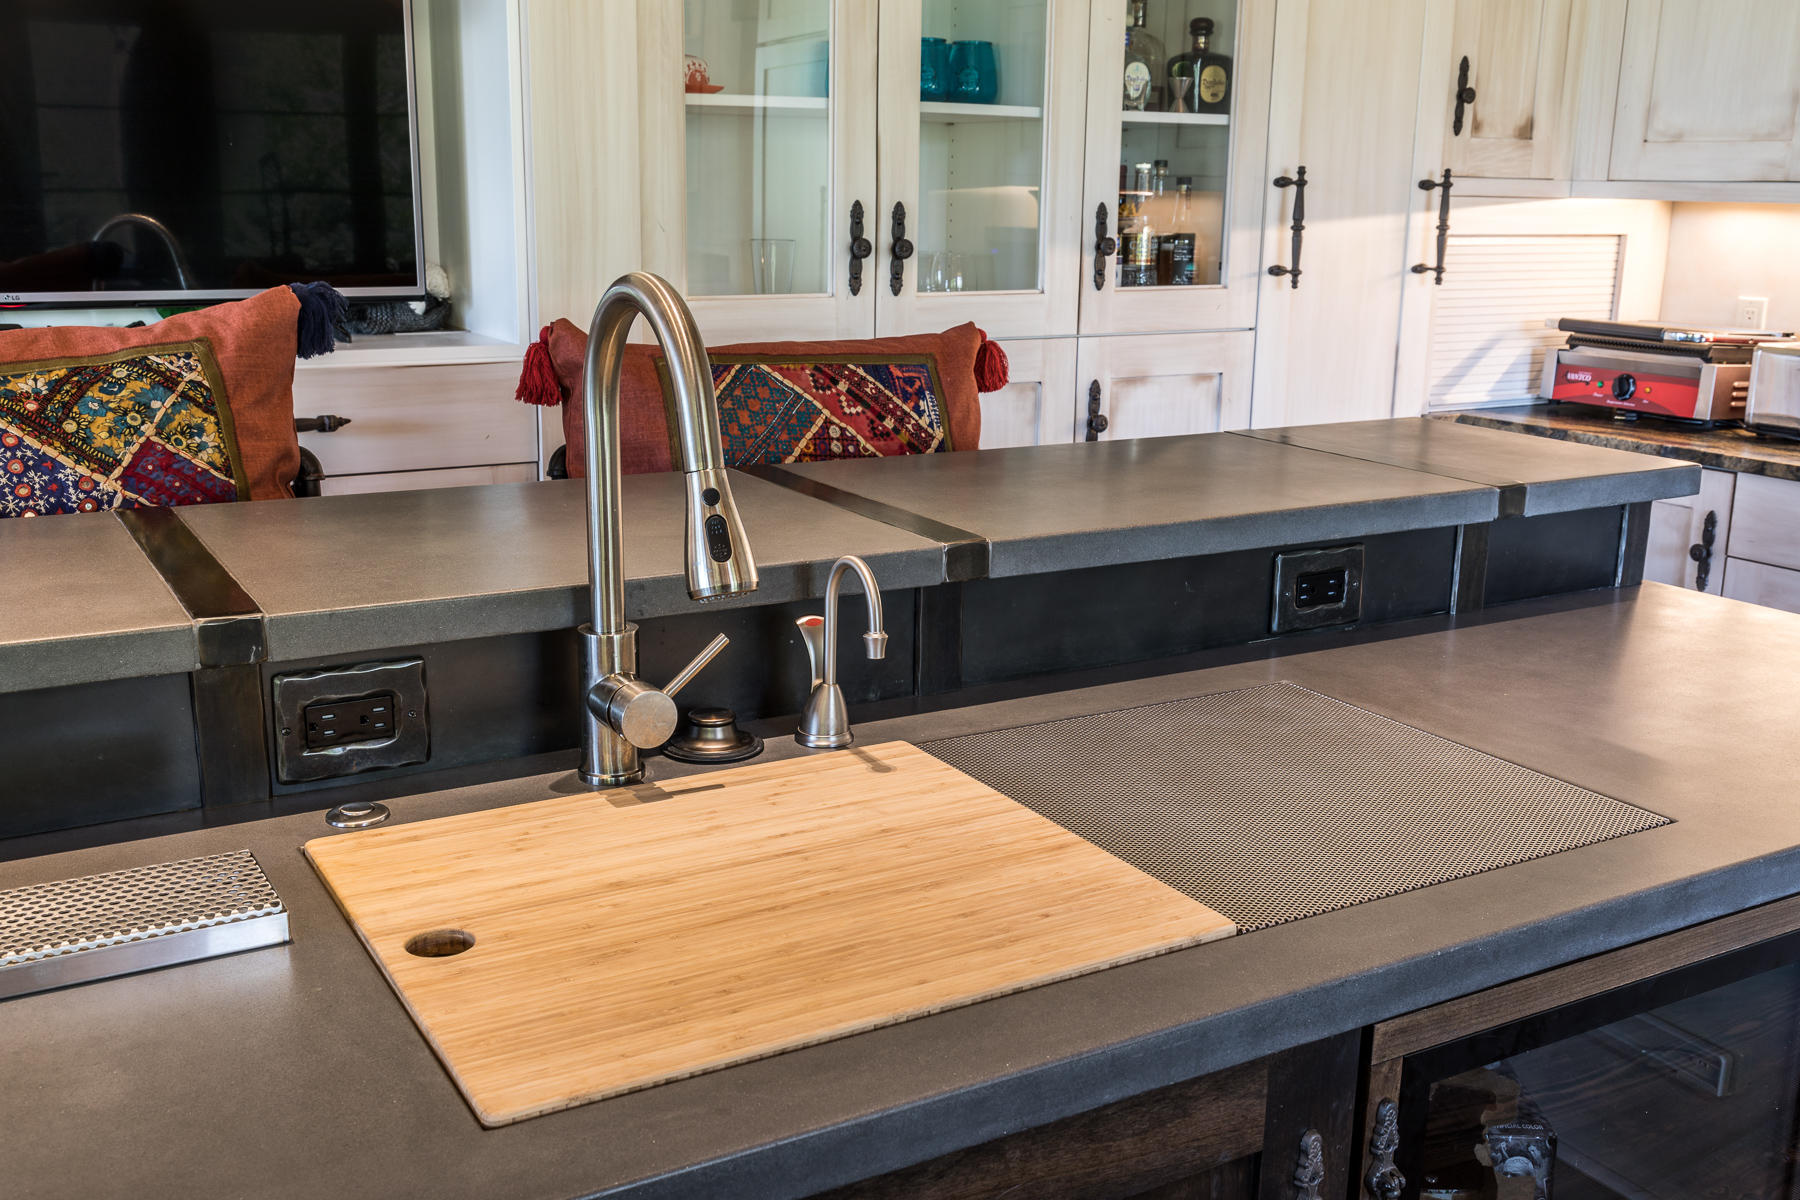 Copy of Integrated Drainboard Sink Detail.jpg